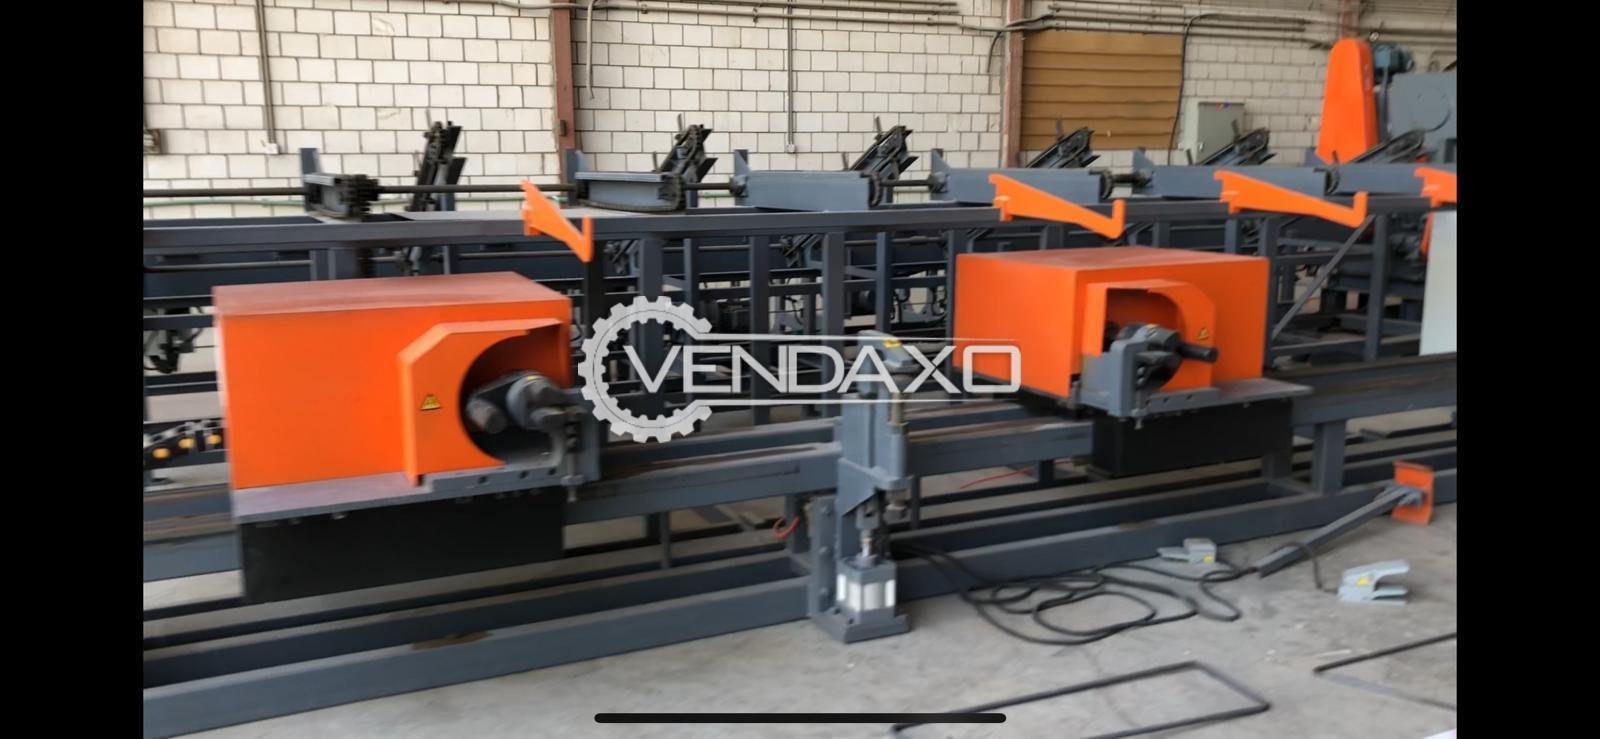 CAB Make Automatic Rebar Cut & Bend Machinery - 40 mm, 2018 Model